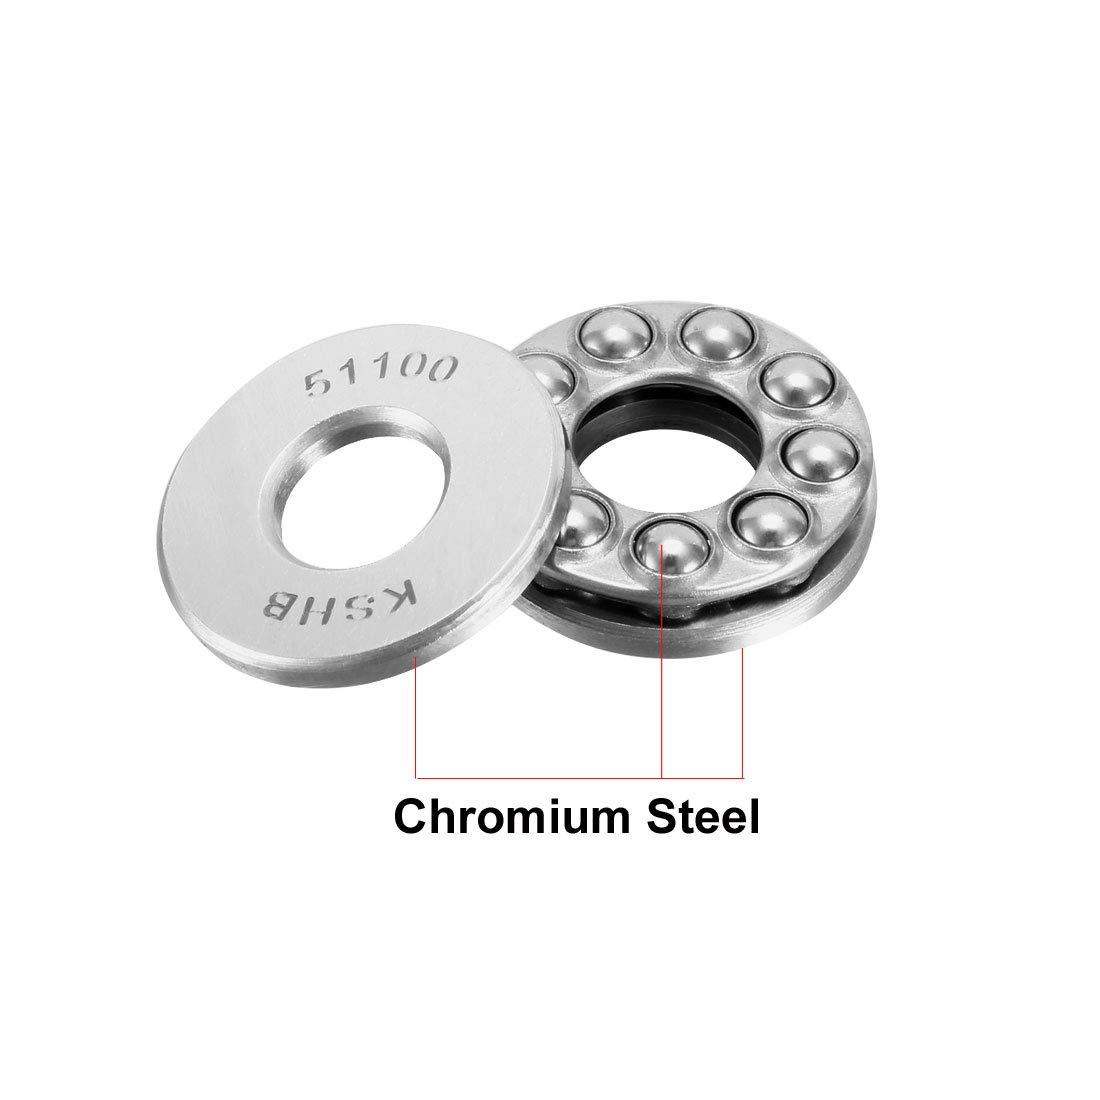 Uxcell 51100 Single Direction Thrust Kugel Bearings 10Mm X 24Mm X 9Mm Chrome Steel Pack von 5